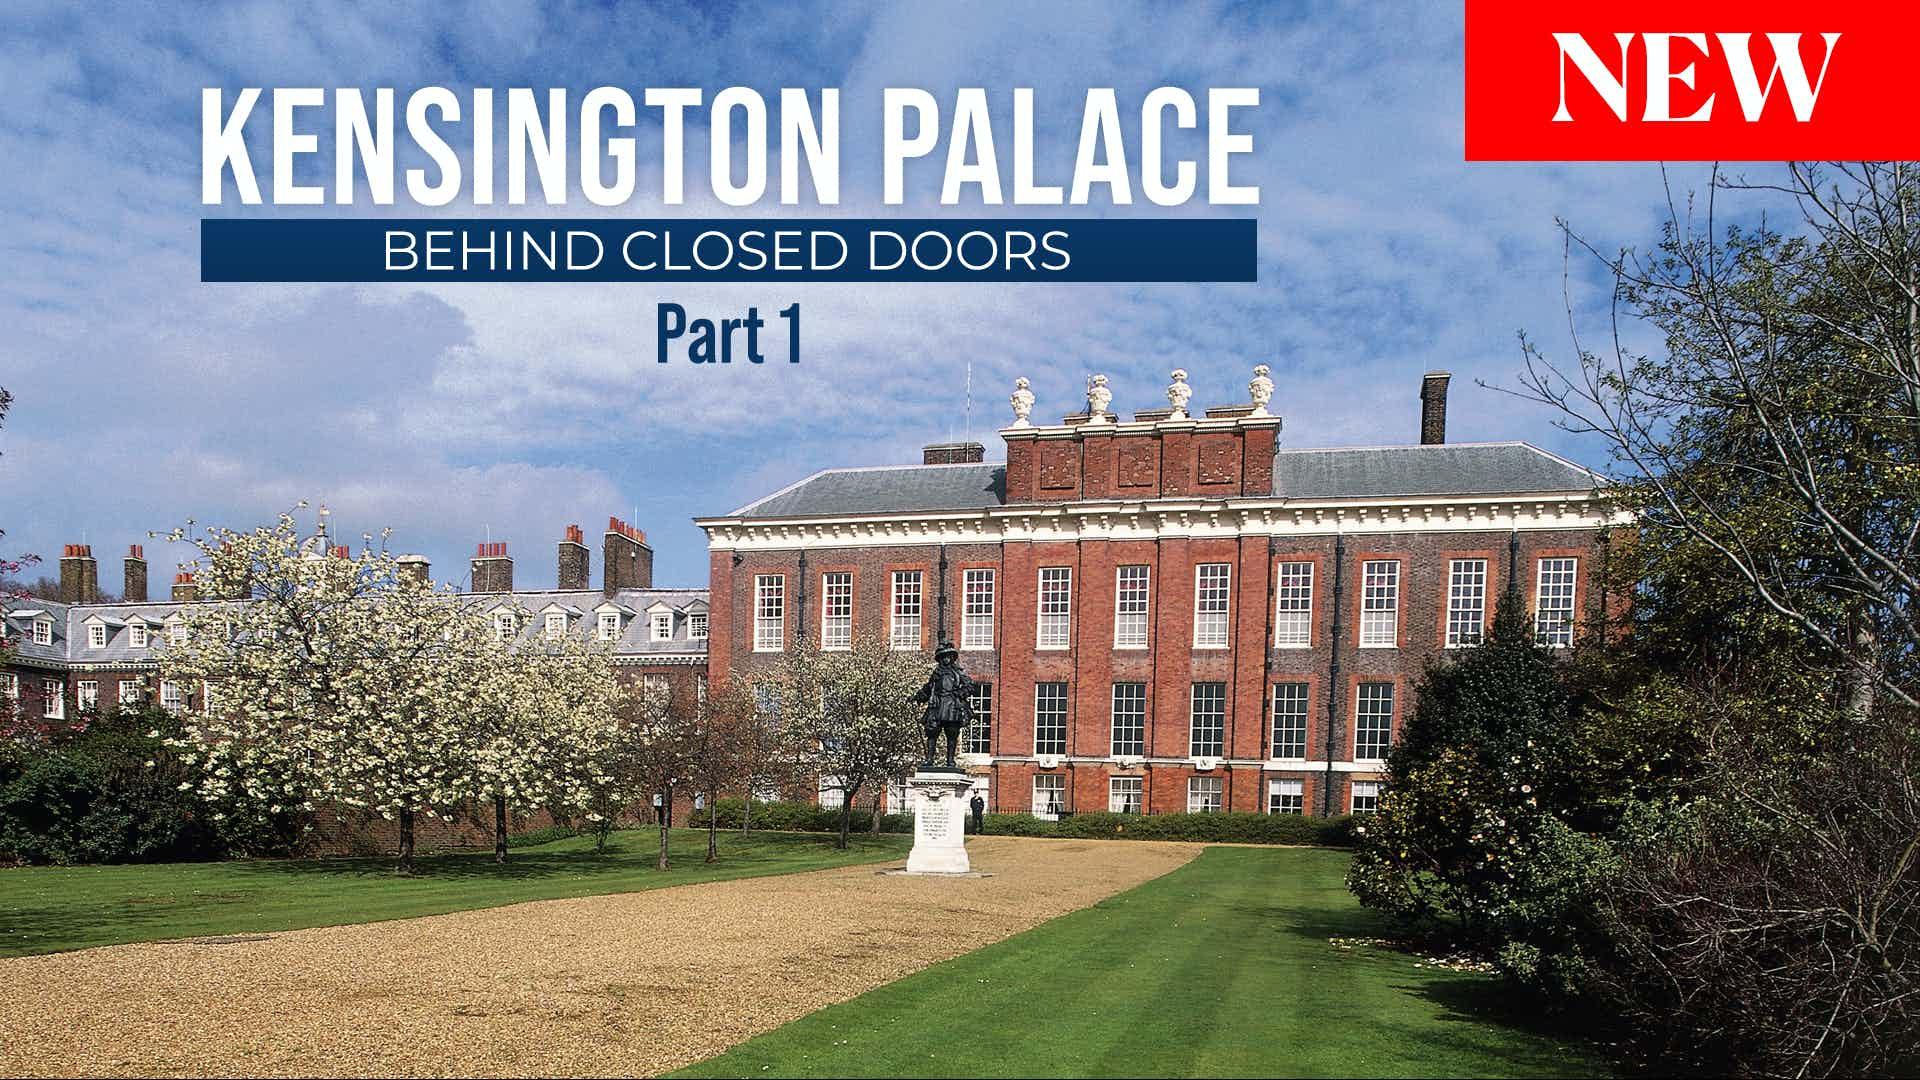 Kensington Palace: Behind Closed Doors -Episode 1